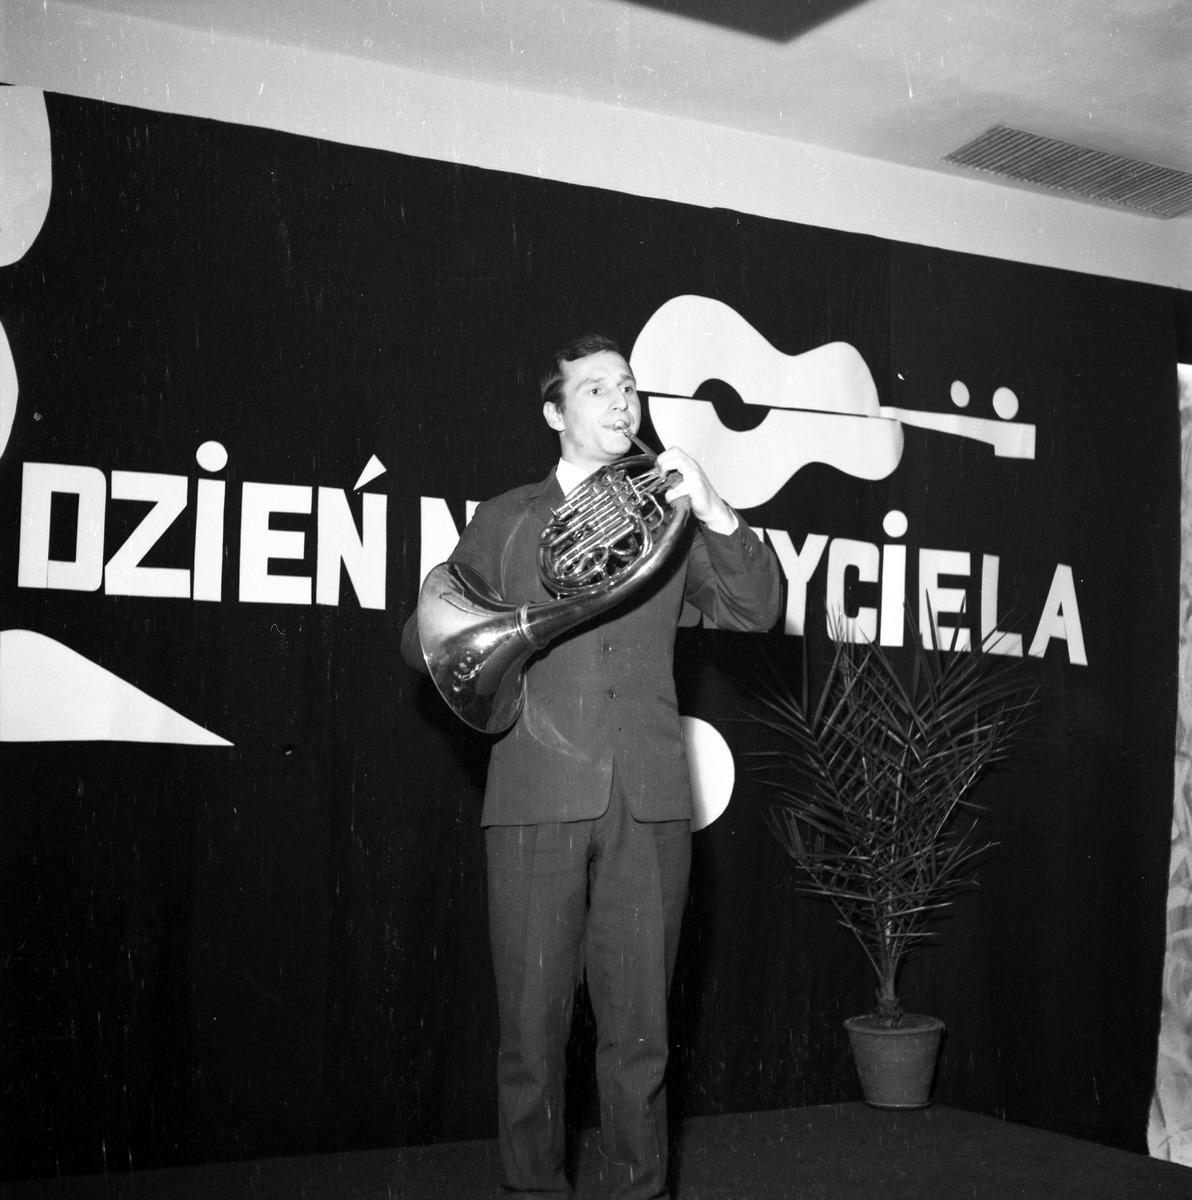 Dzień Nauczyciela, Olsztyn 1966 r.